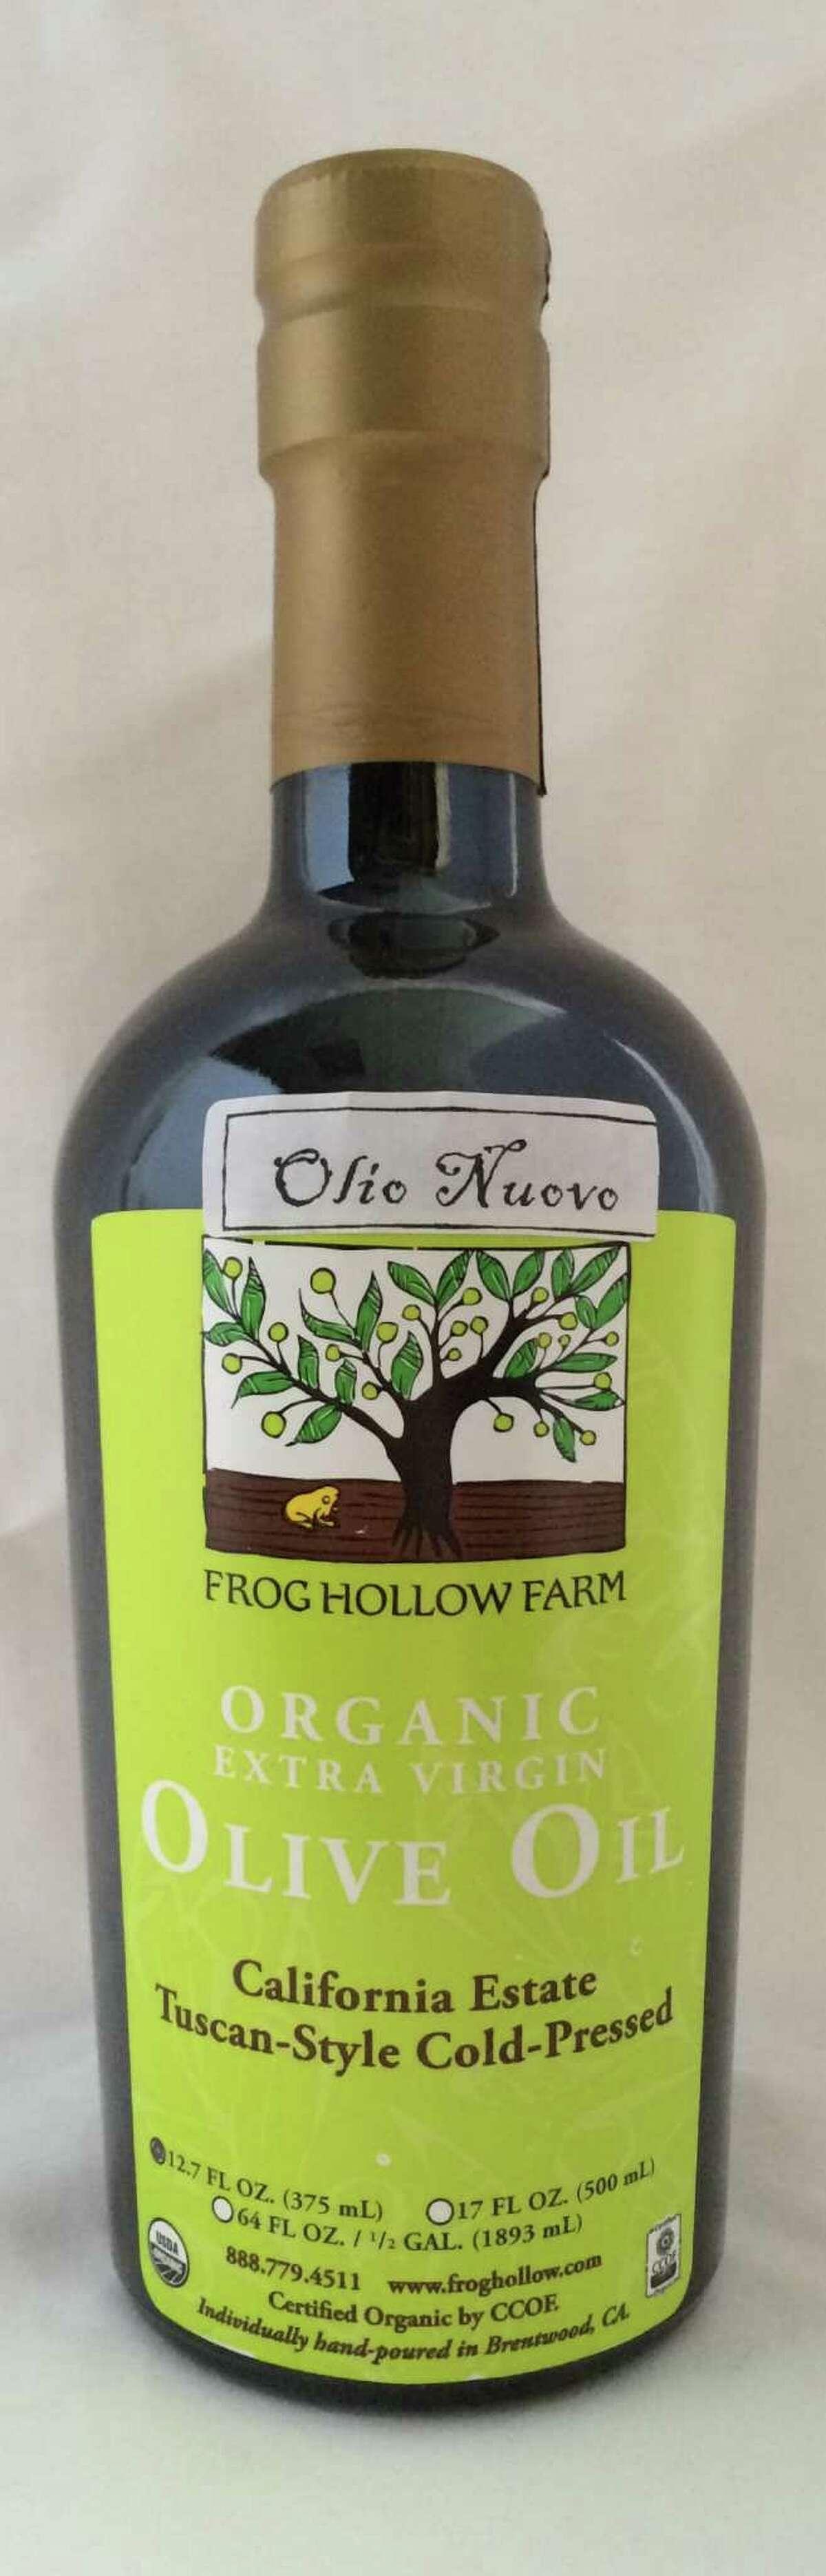 Frog Hollow Farm olio nuovo